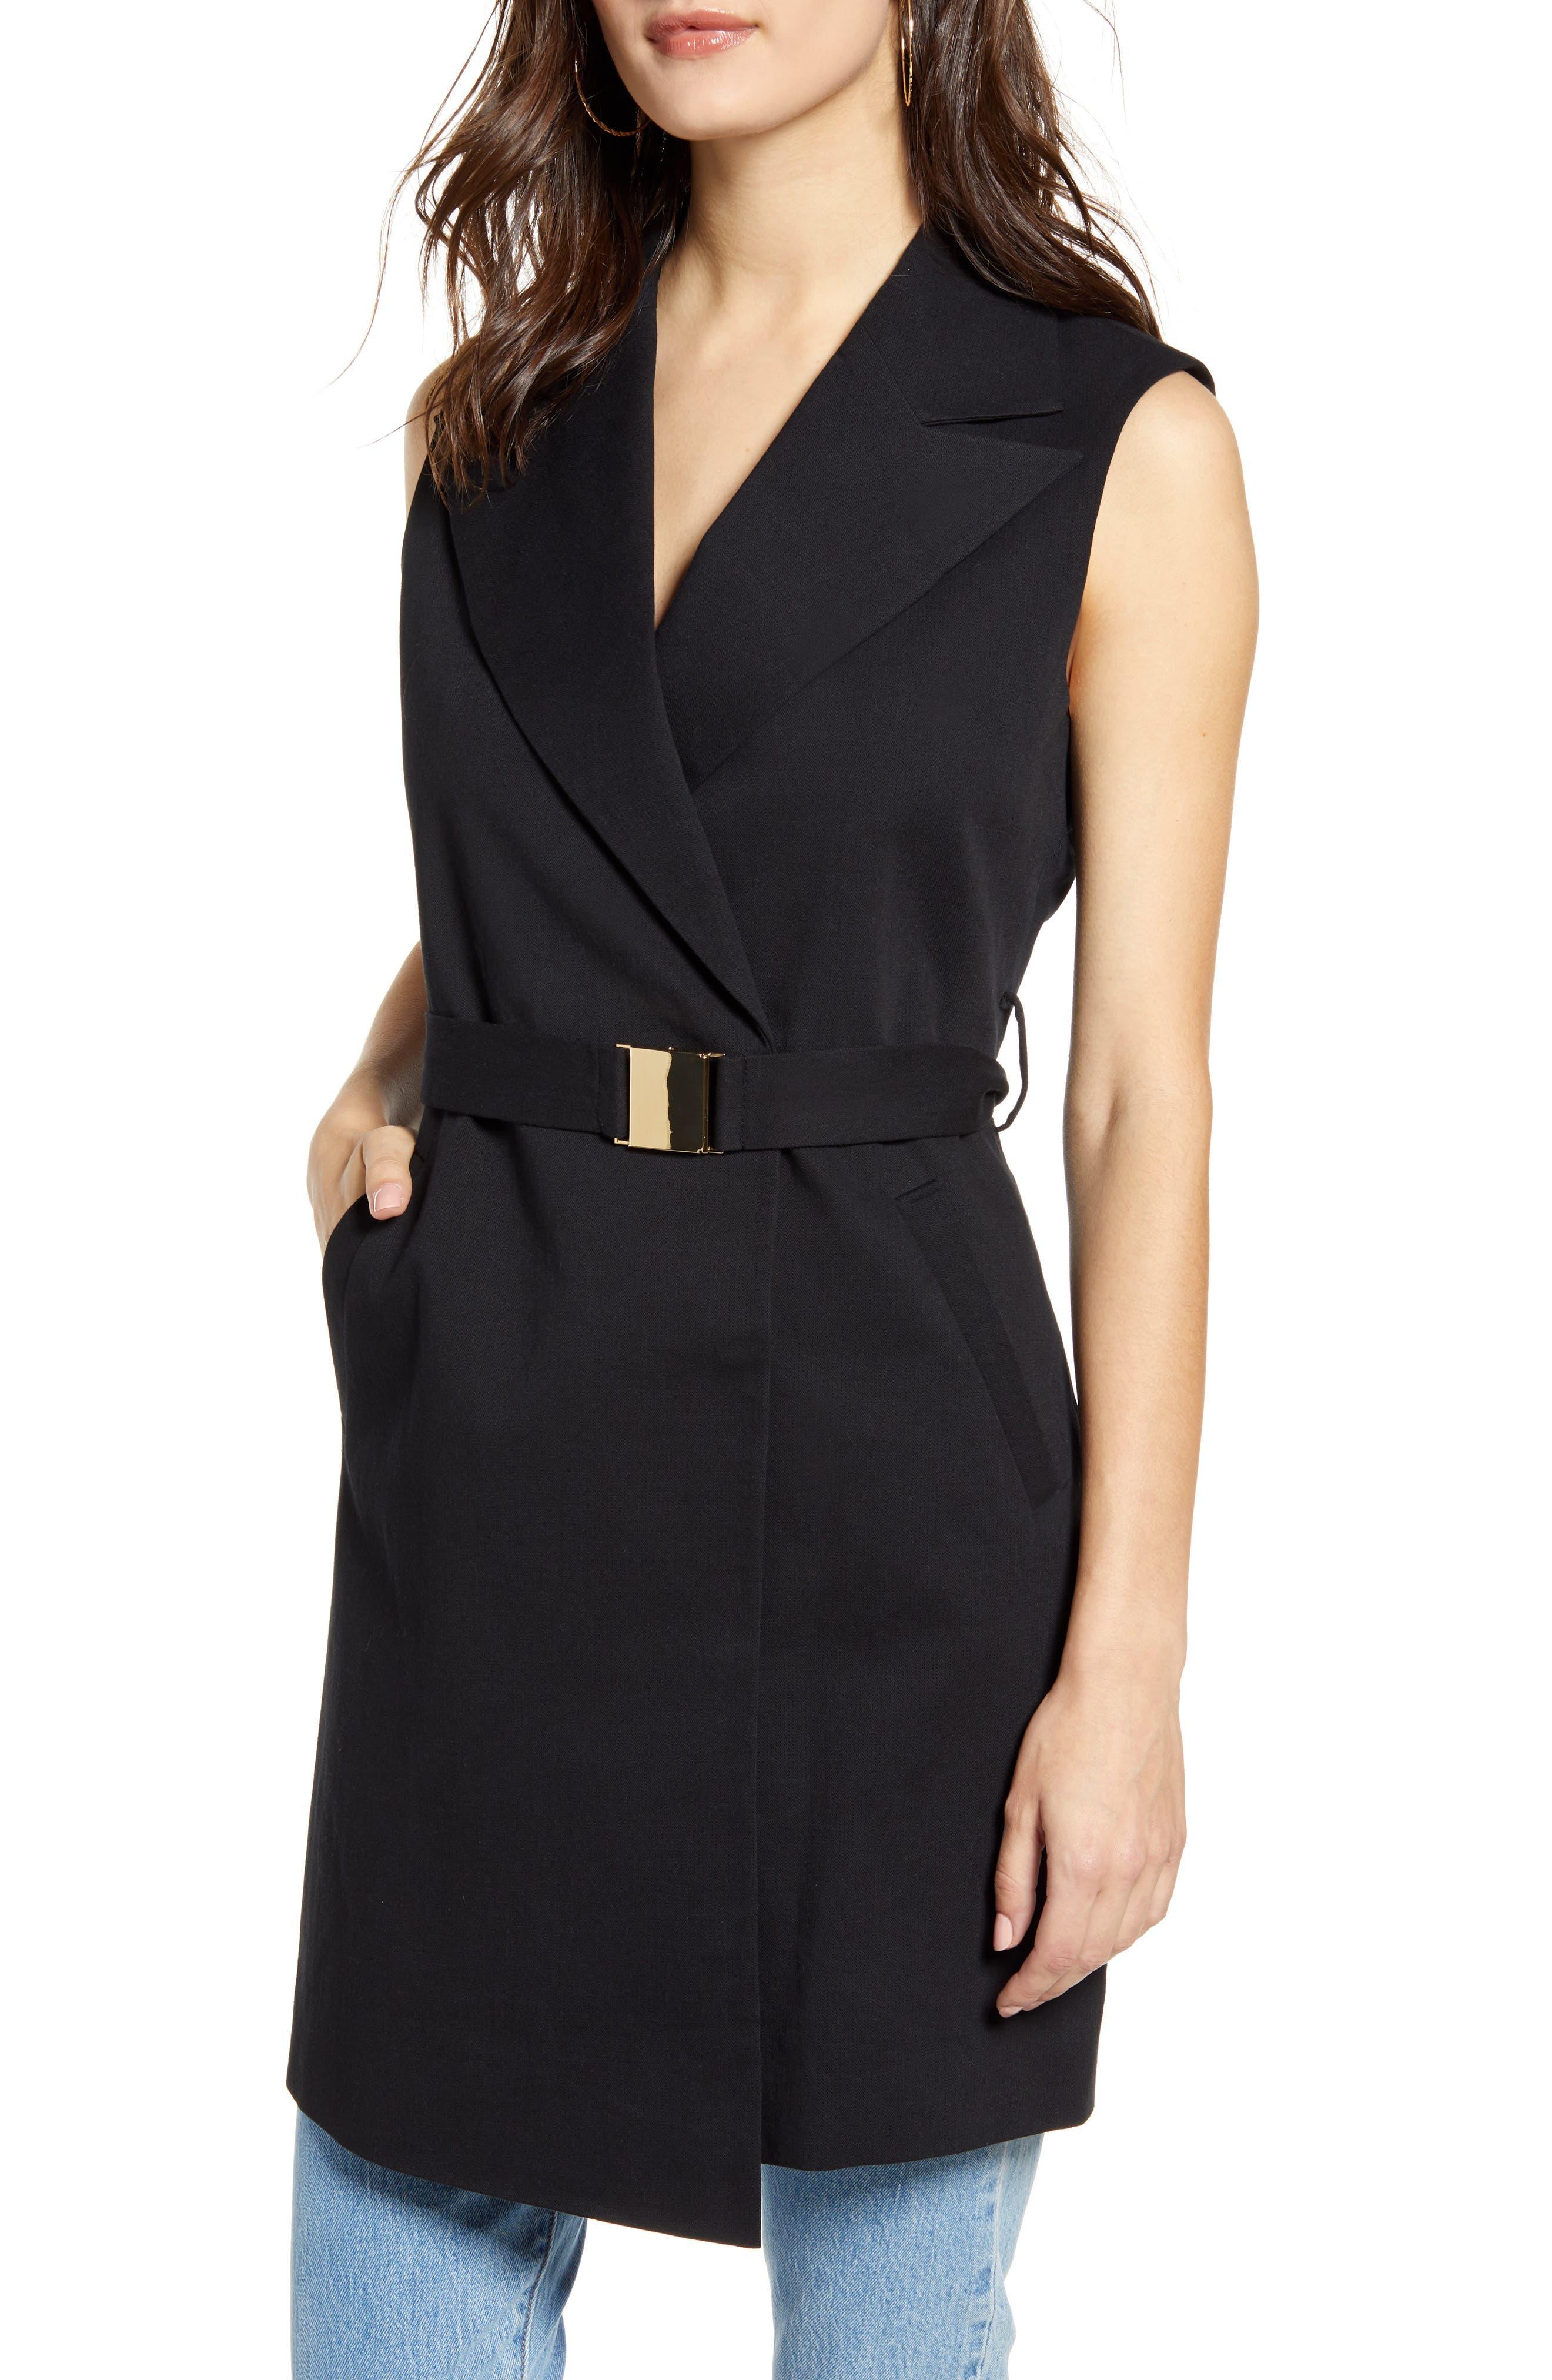 Topshop Belted Sleeveless Blazer Dress, US (fits like 0) - Black